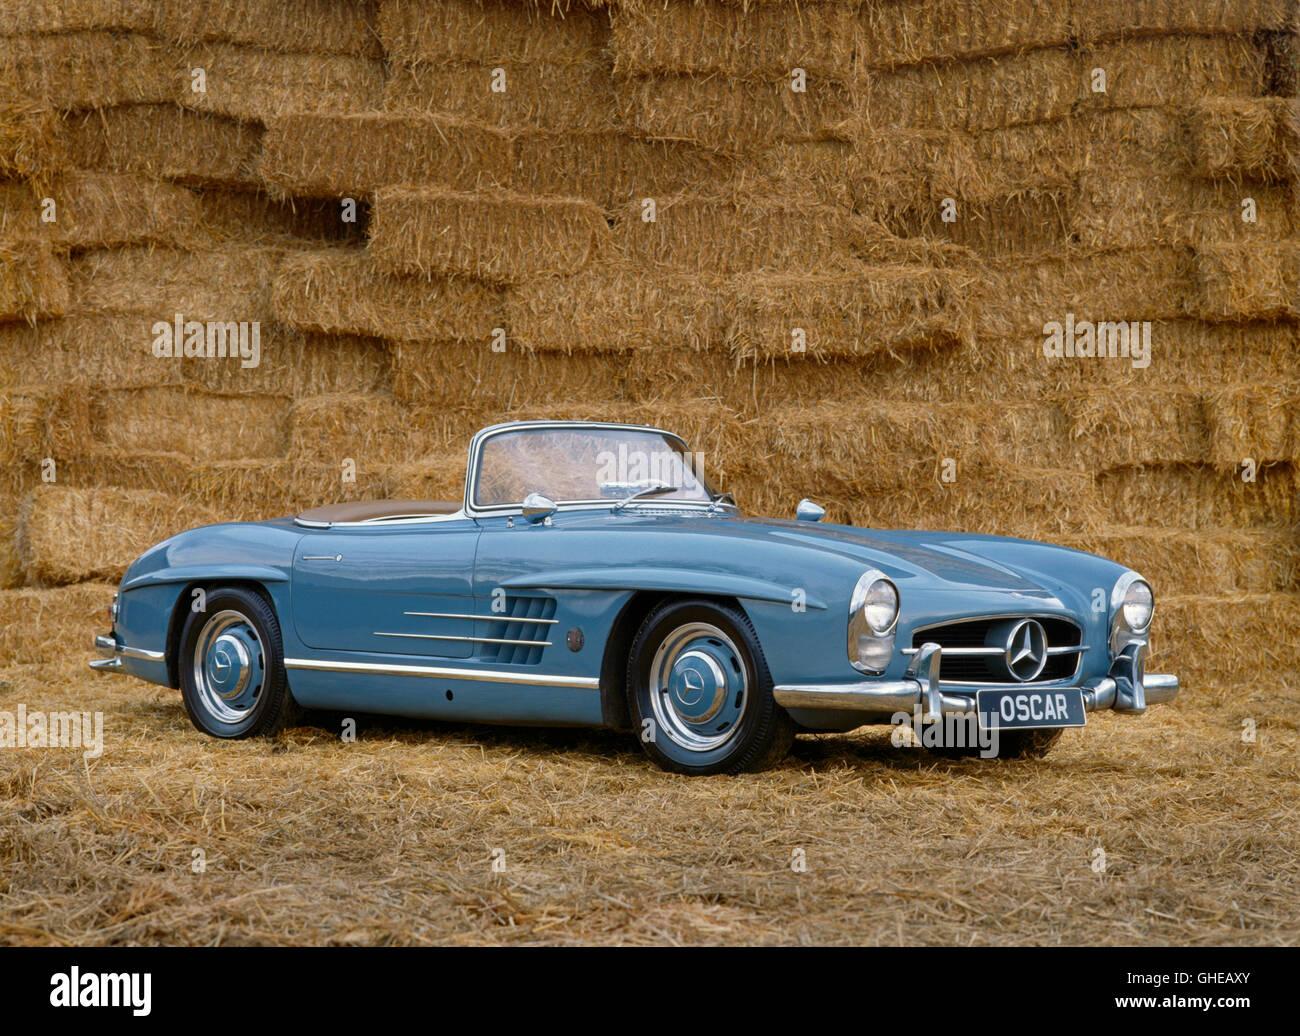 1962 mercedes benz 300sl roadster 3 0 litre inline 6 for 1962 mercedes benz